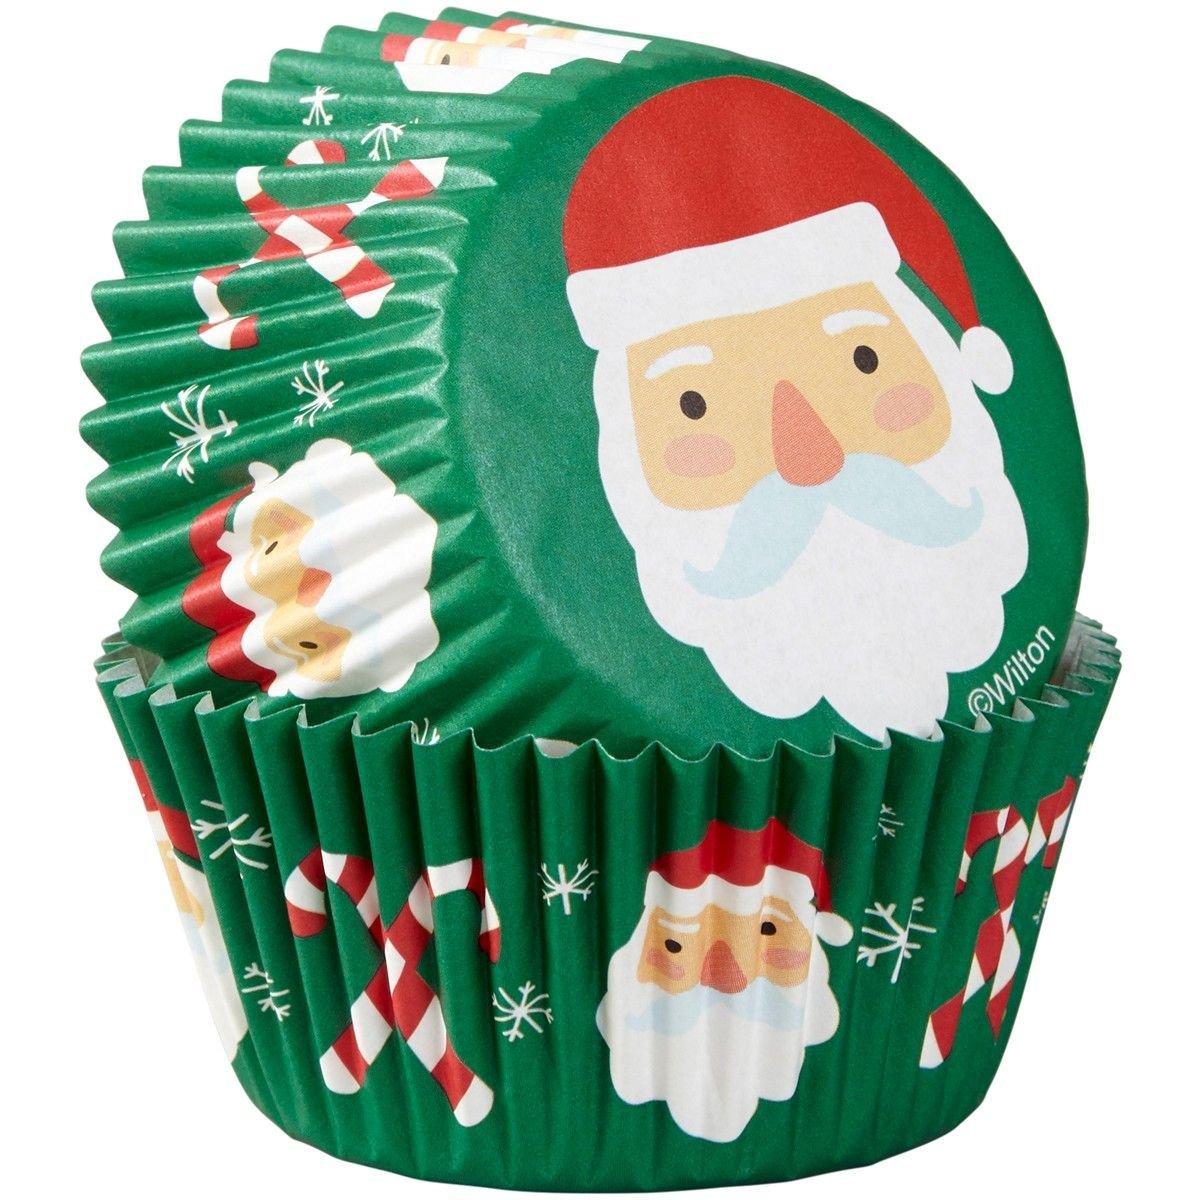 Wilton - Baking Cups Santa & Candy Cane pack of 75 - θήκες ψησίματος Αγ.Βασίλης & γλειφιτζούρι - 75τεμ 5εκ